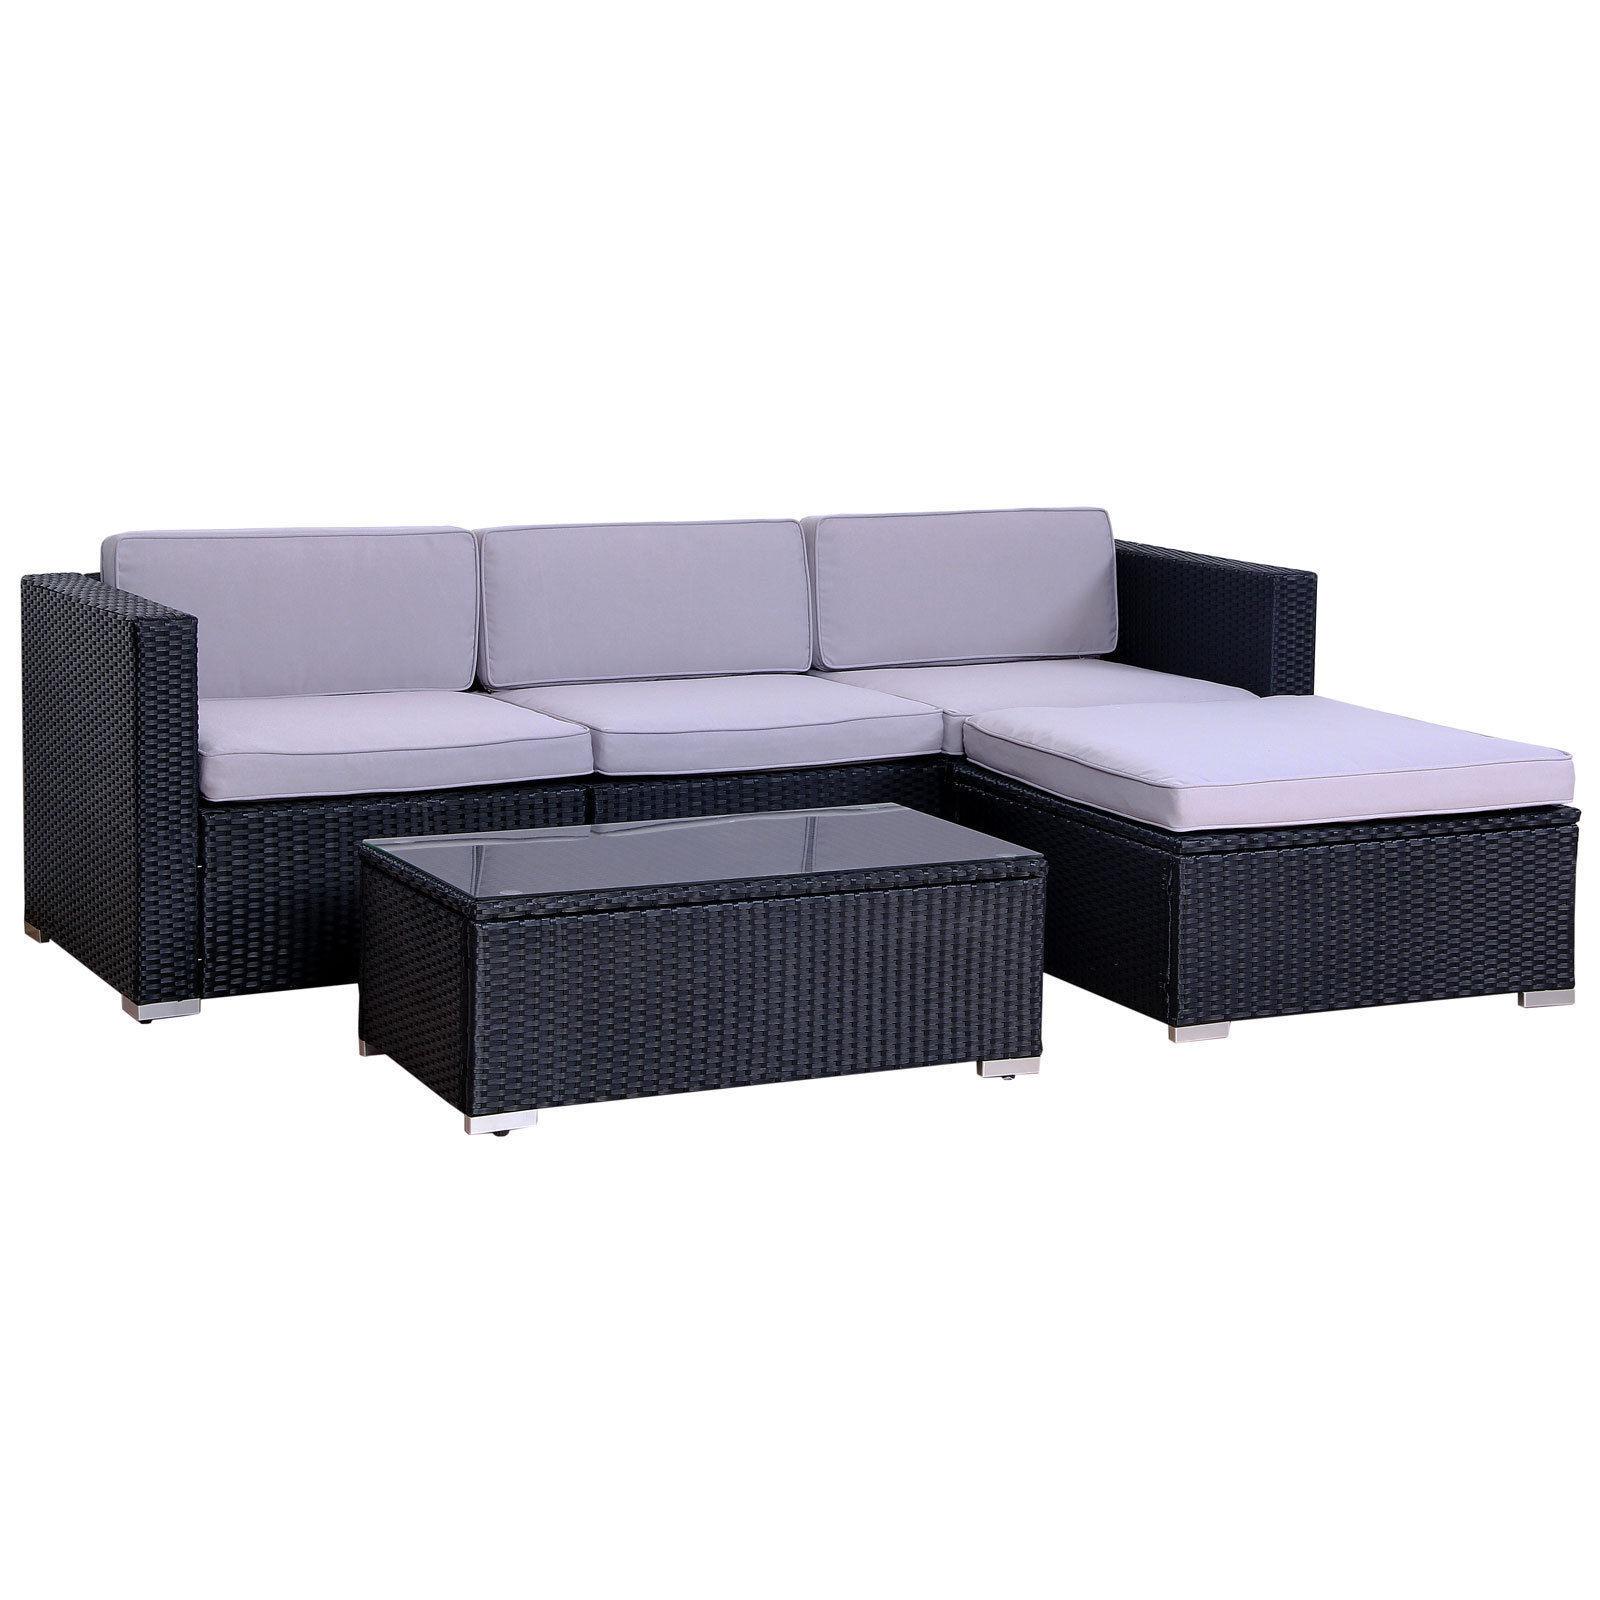 Garden Furniture - Evre Outdoor Four Person Rattan Garden Furniture Set Modular Set Patio Sofa